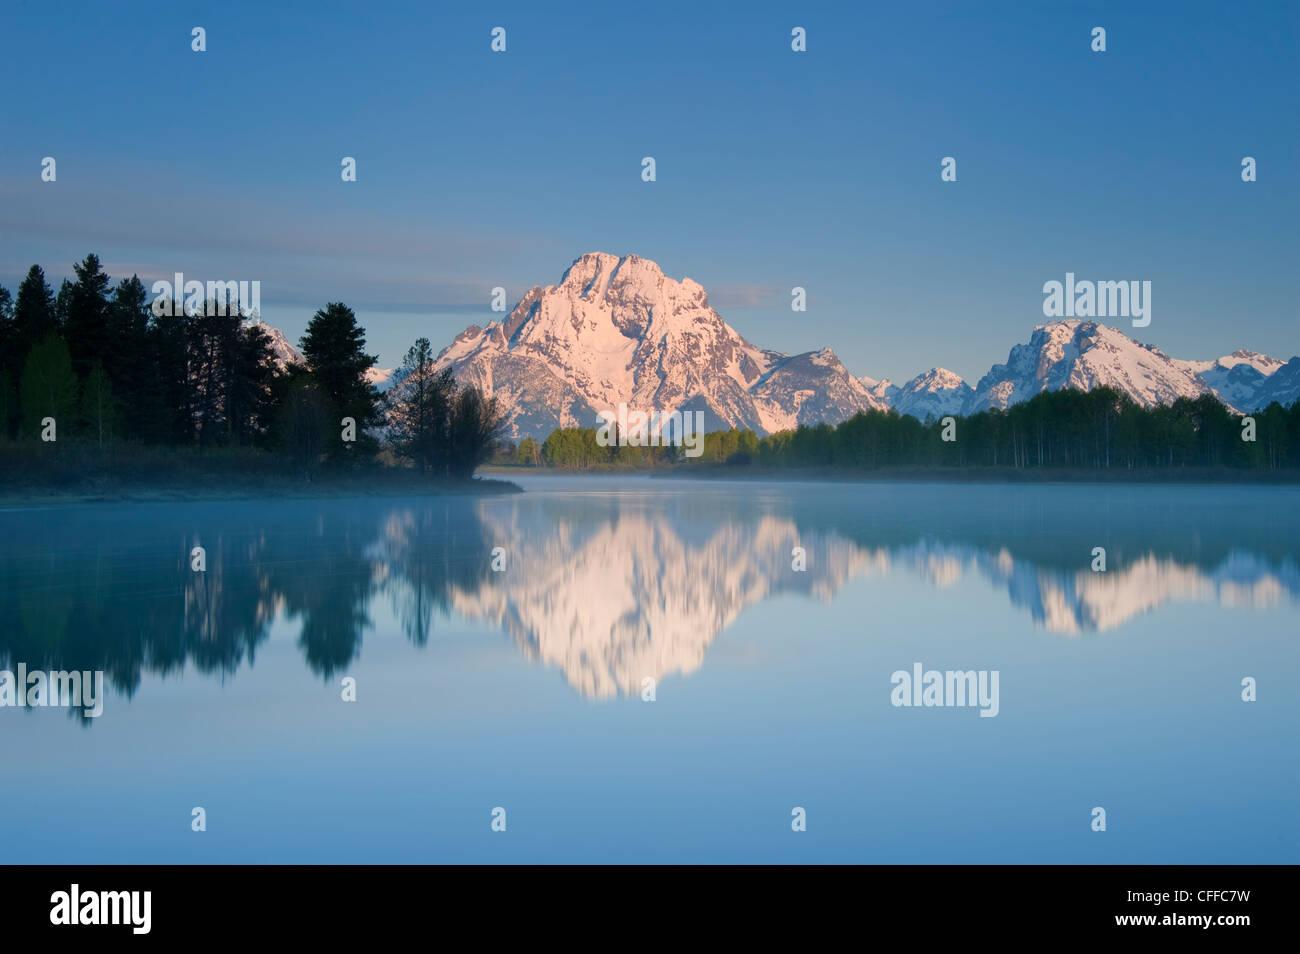 Mount Moran reflected in the Snake River, Grand Teton National Park, Wyoming Stock Photo